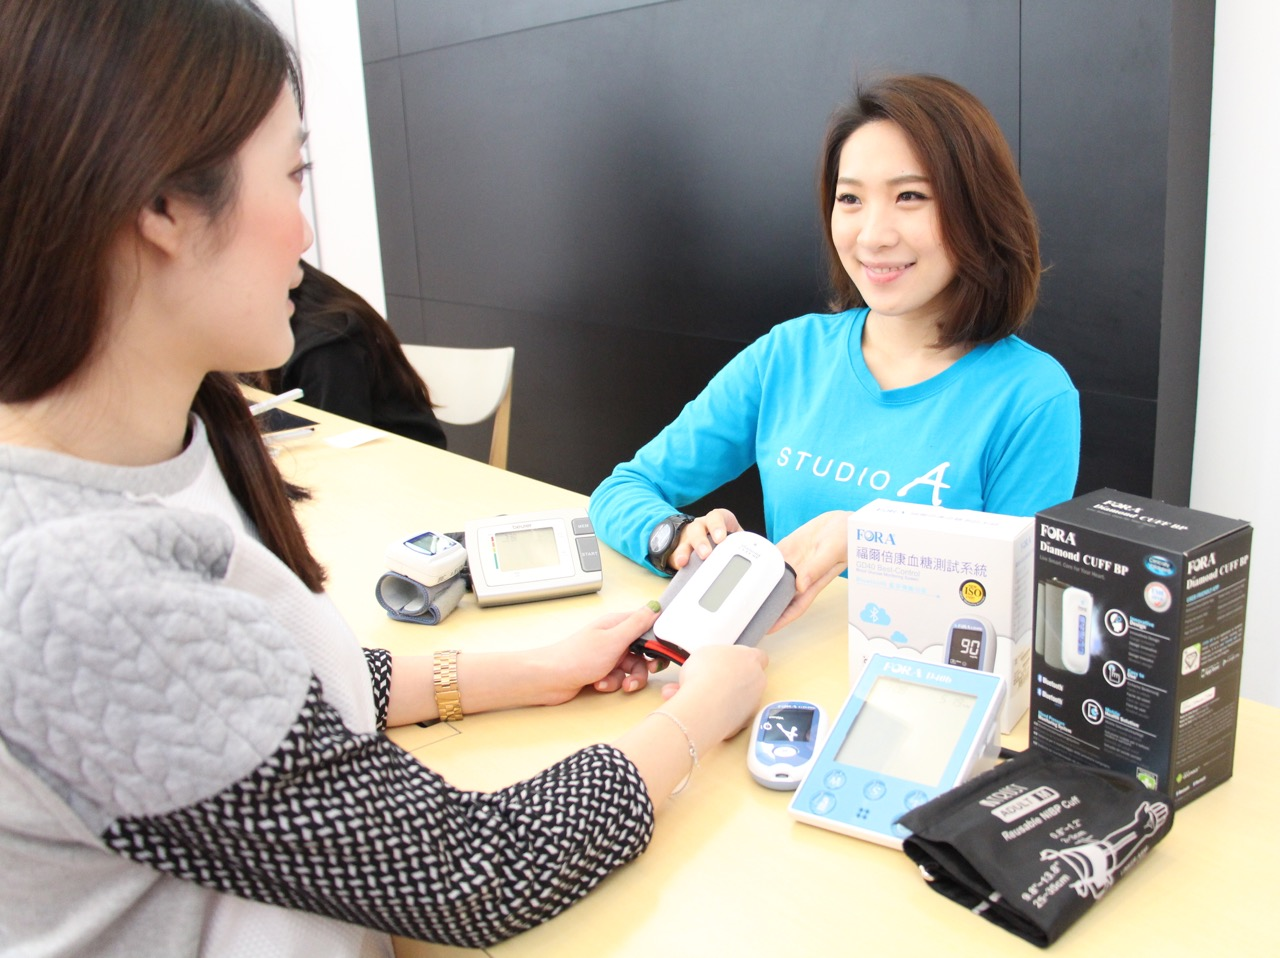 STUDIO A × 泰博科技 首款結合APP雲端管理血壓血糖機,不限廠牌,損壞與否,舊換新5.4折起